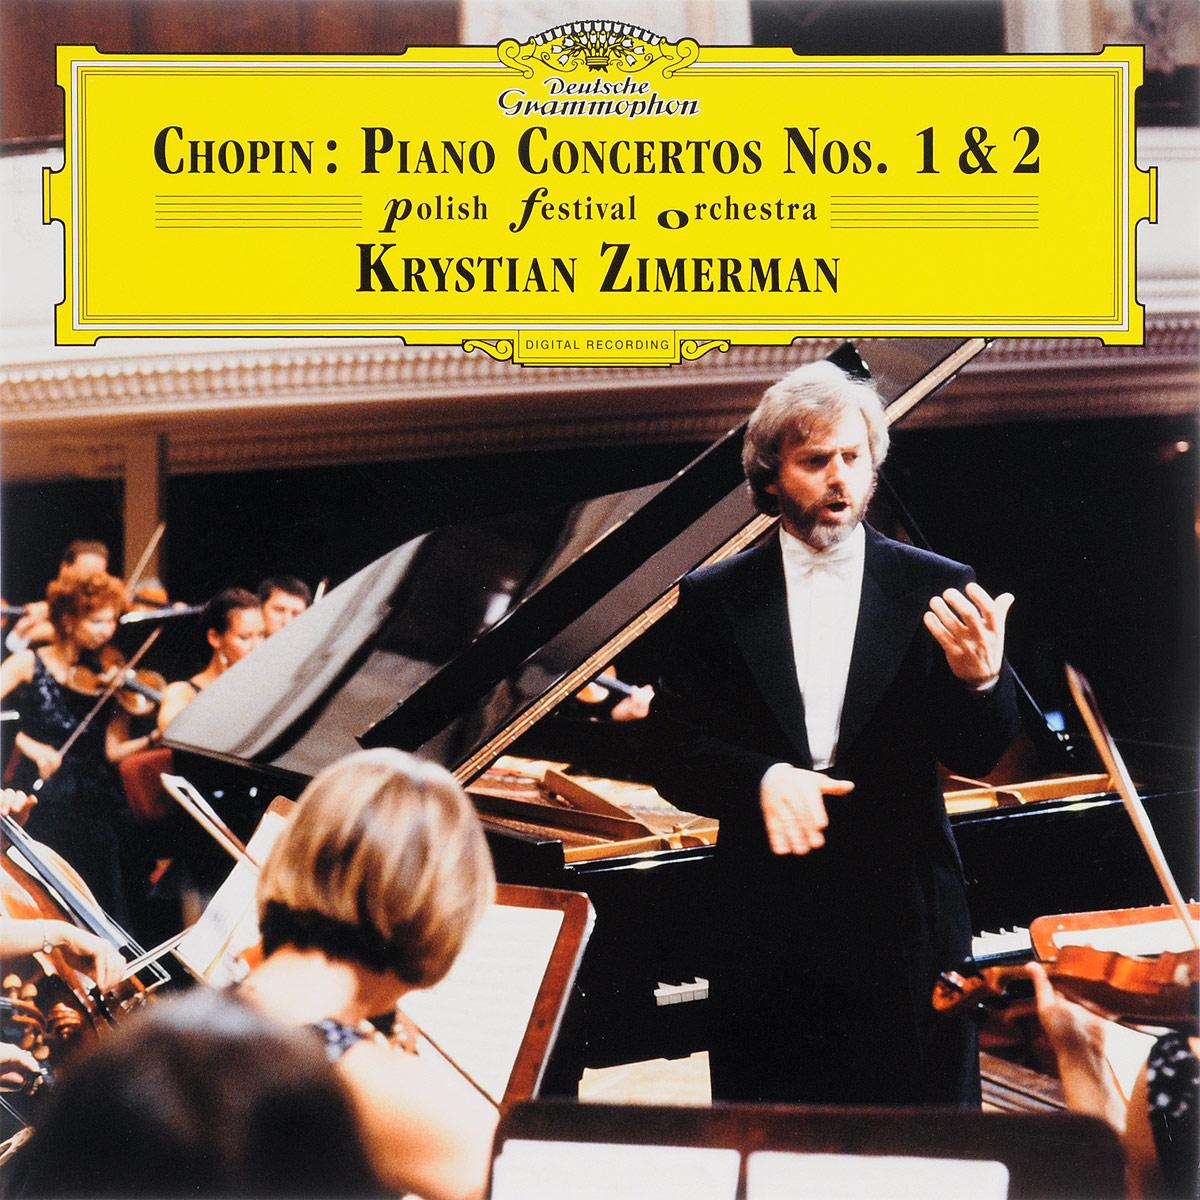 лучшая цена Кристиан Цимерман,Polish Festival Orchestra Krystian Zimerman. Chopin. Piano Concertos Nos. 1 & 2 (2 LP)